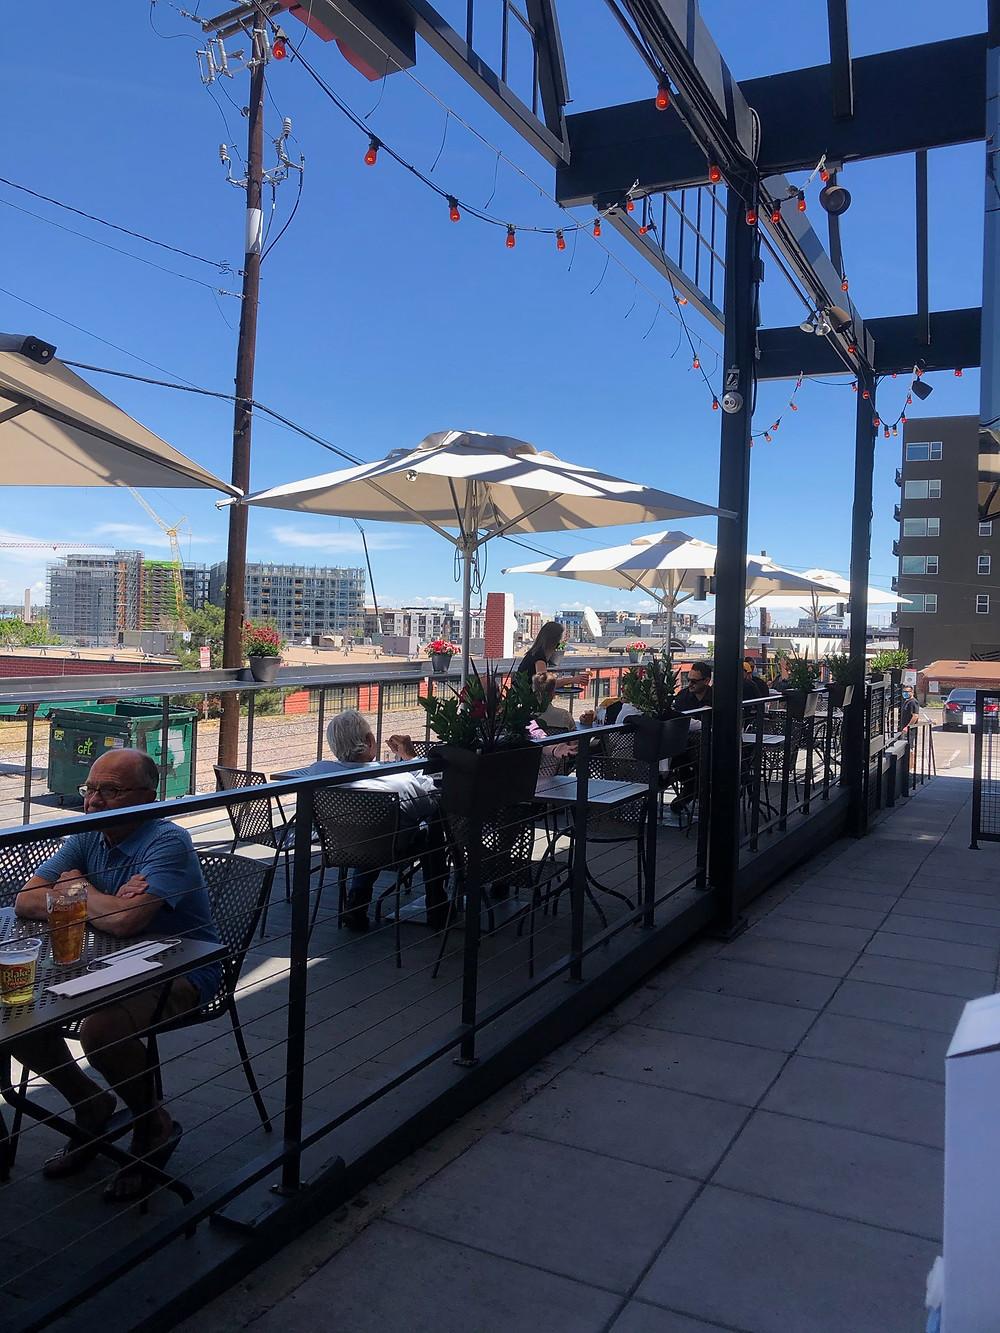 Blake Street Tavern has Denver's Best Patio downtown!